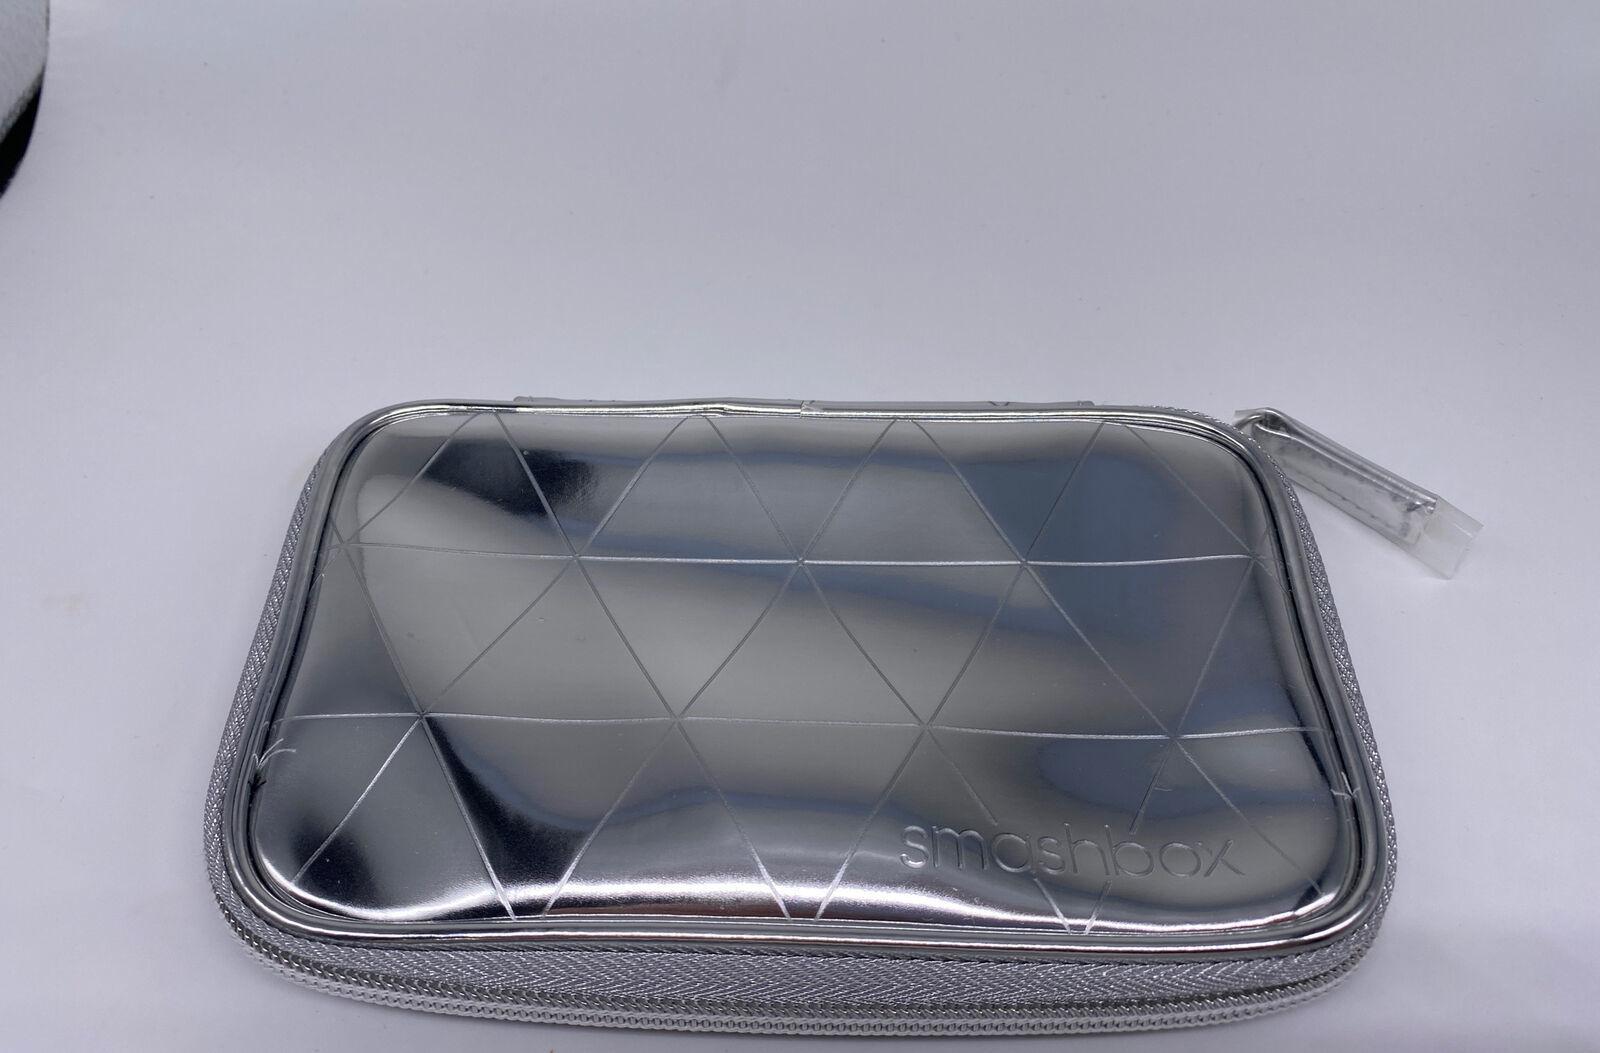 Smashbox Metallic Silver Makeup Bag - $12.86